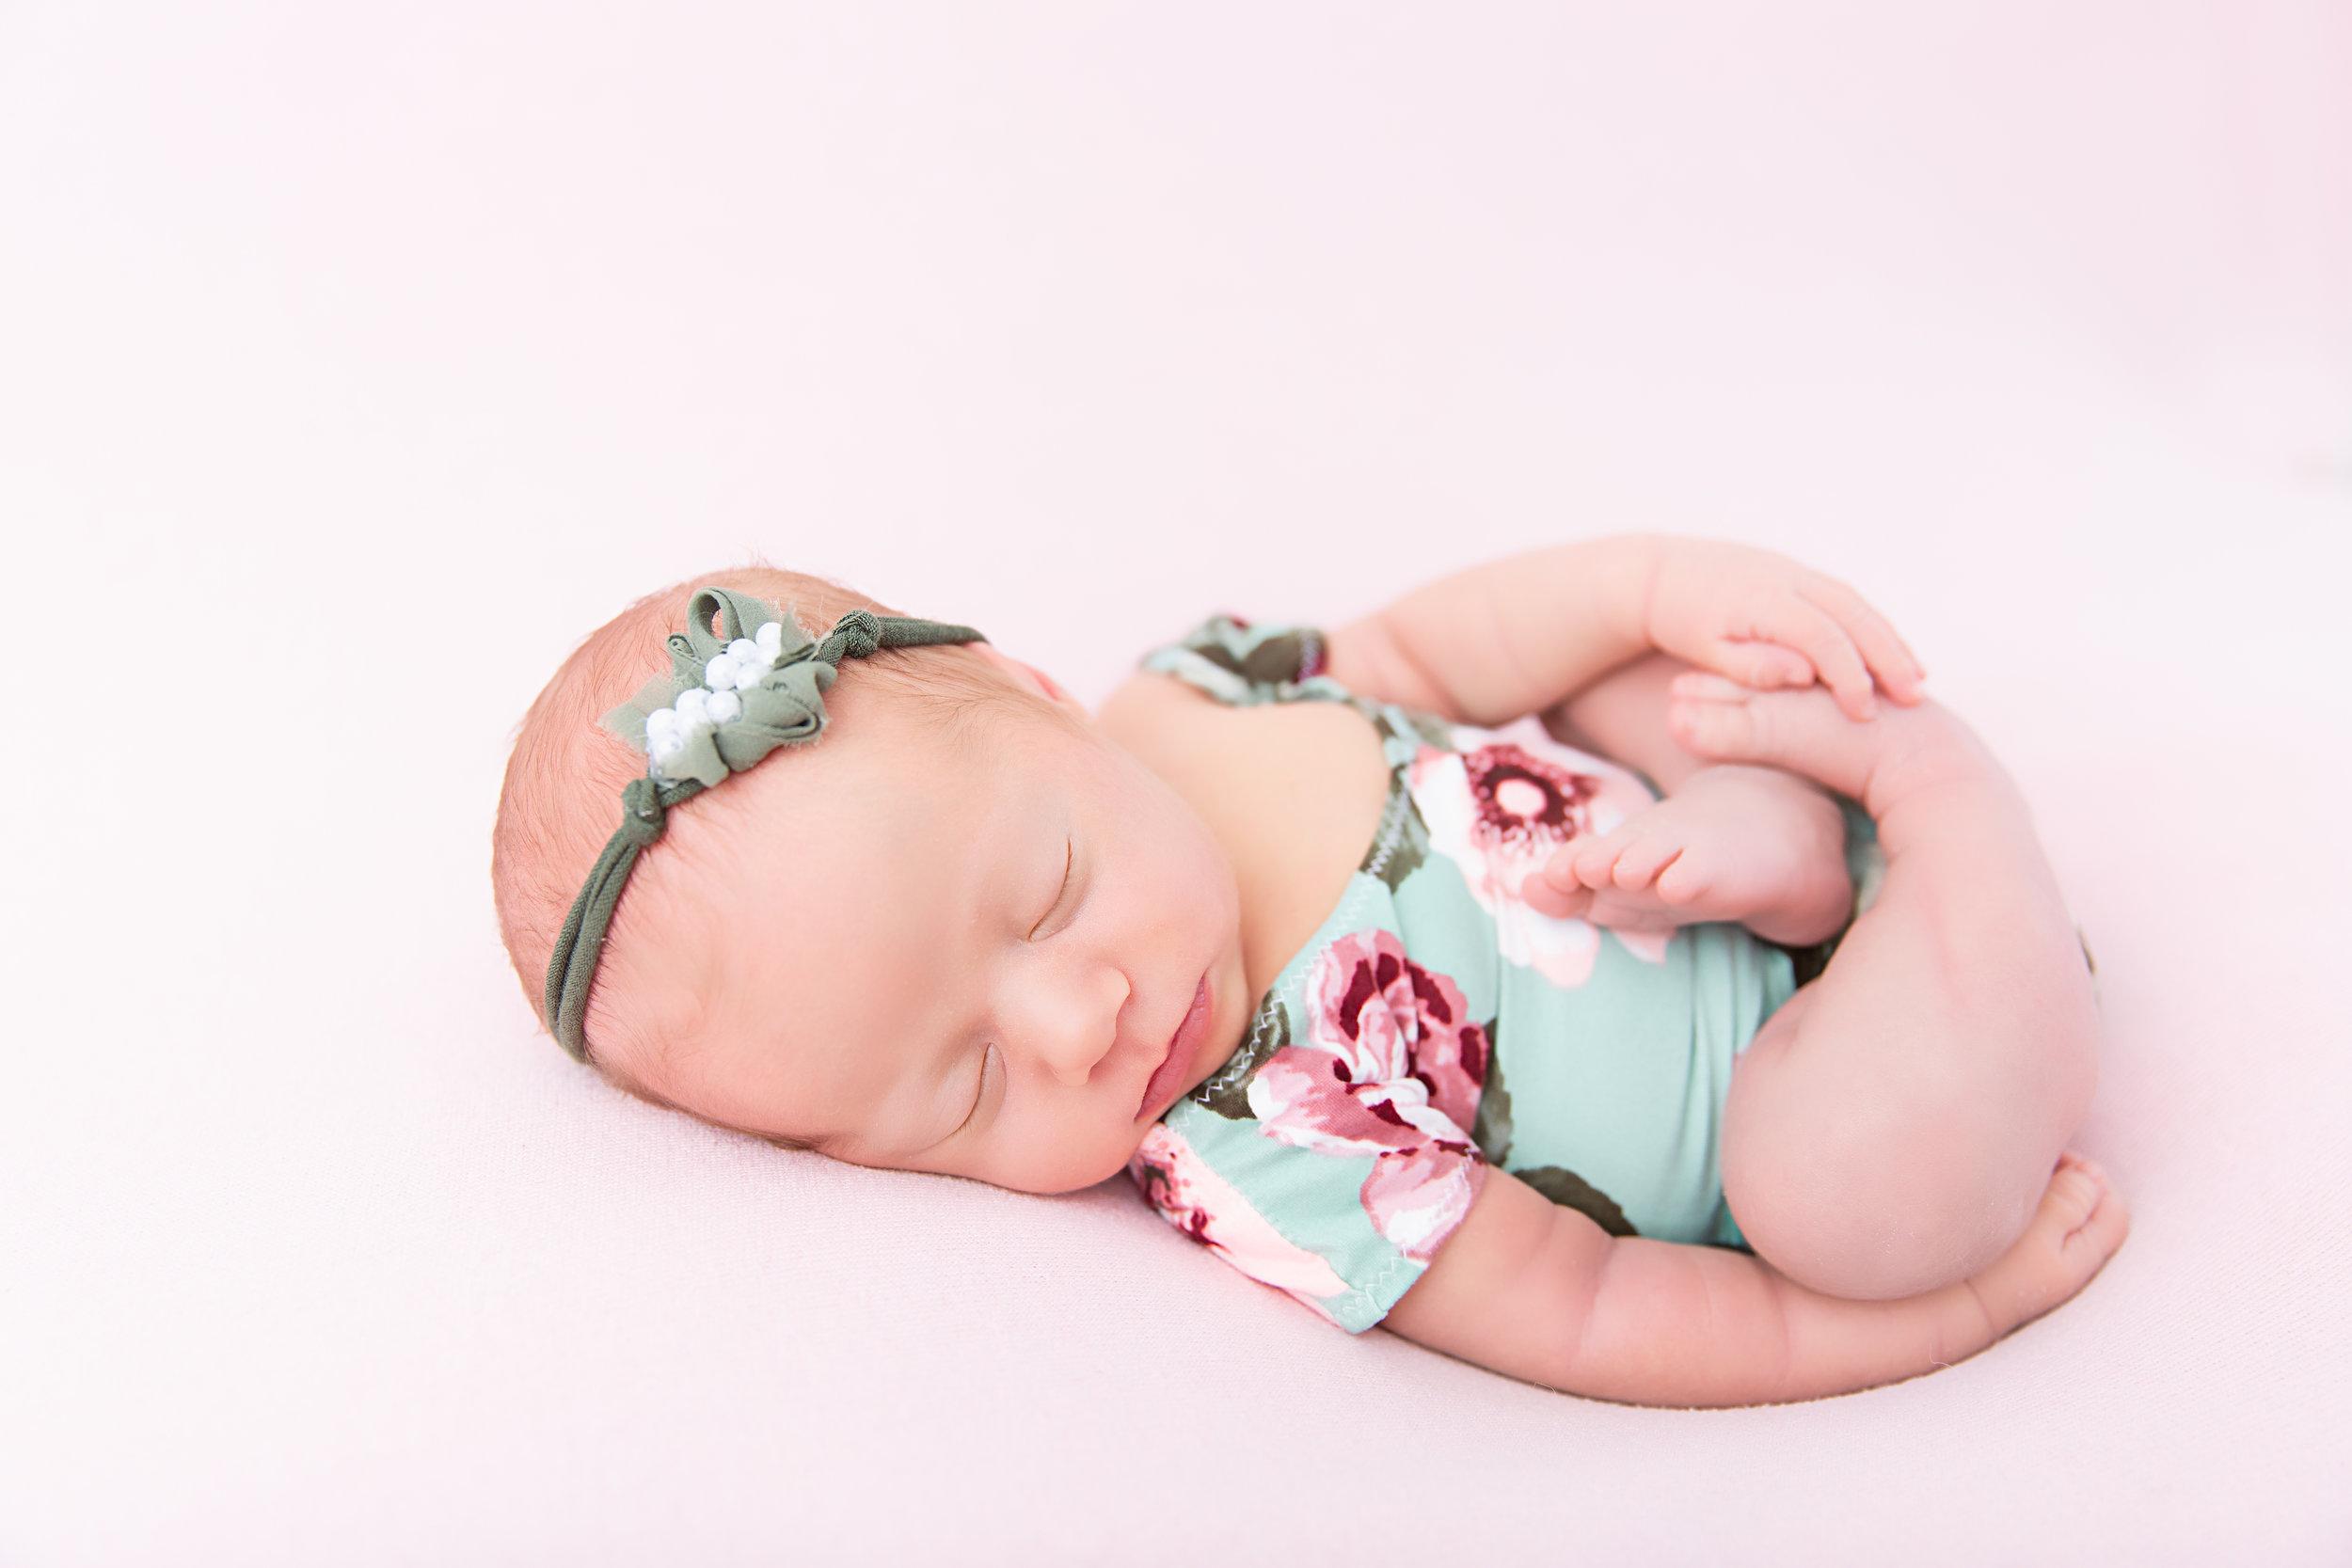 posed newborn baby sleeping